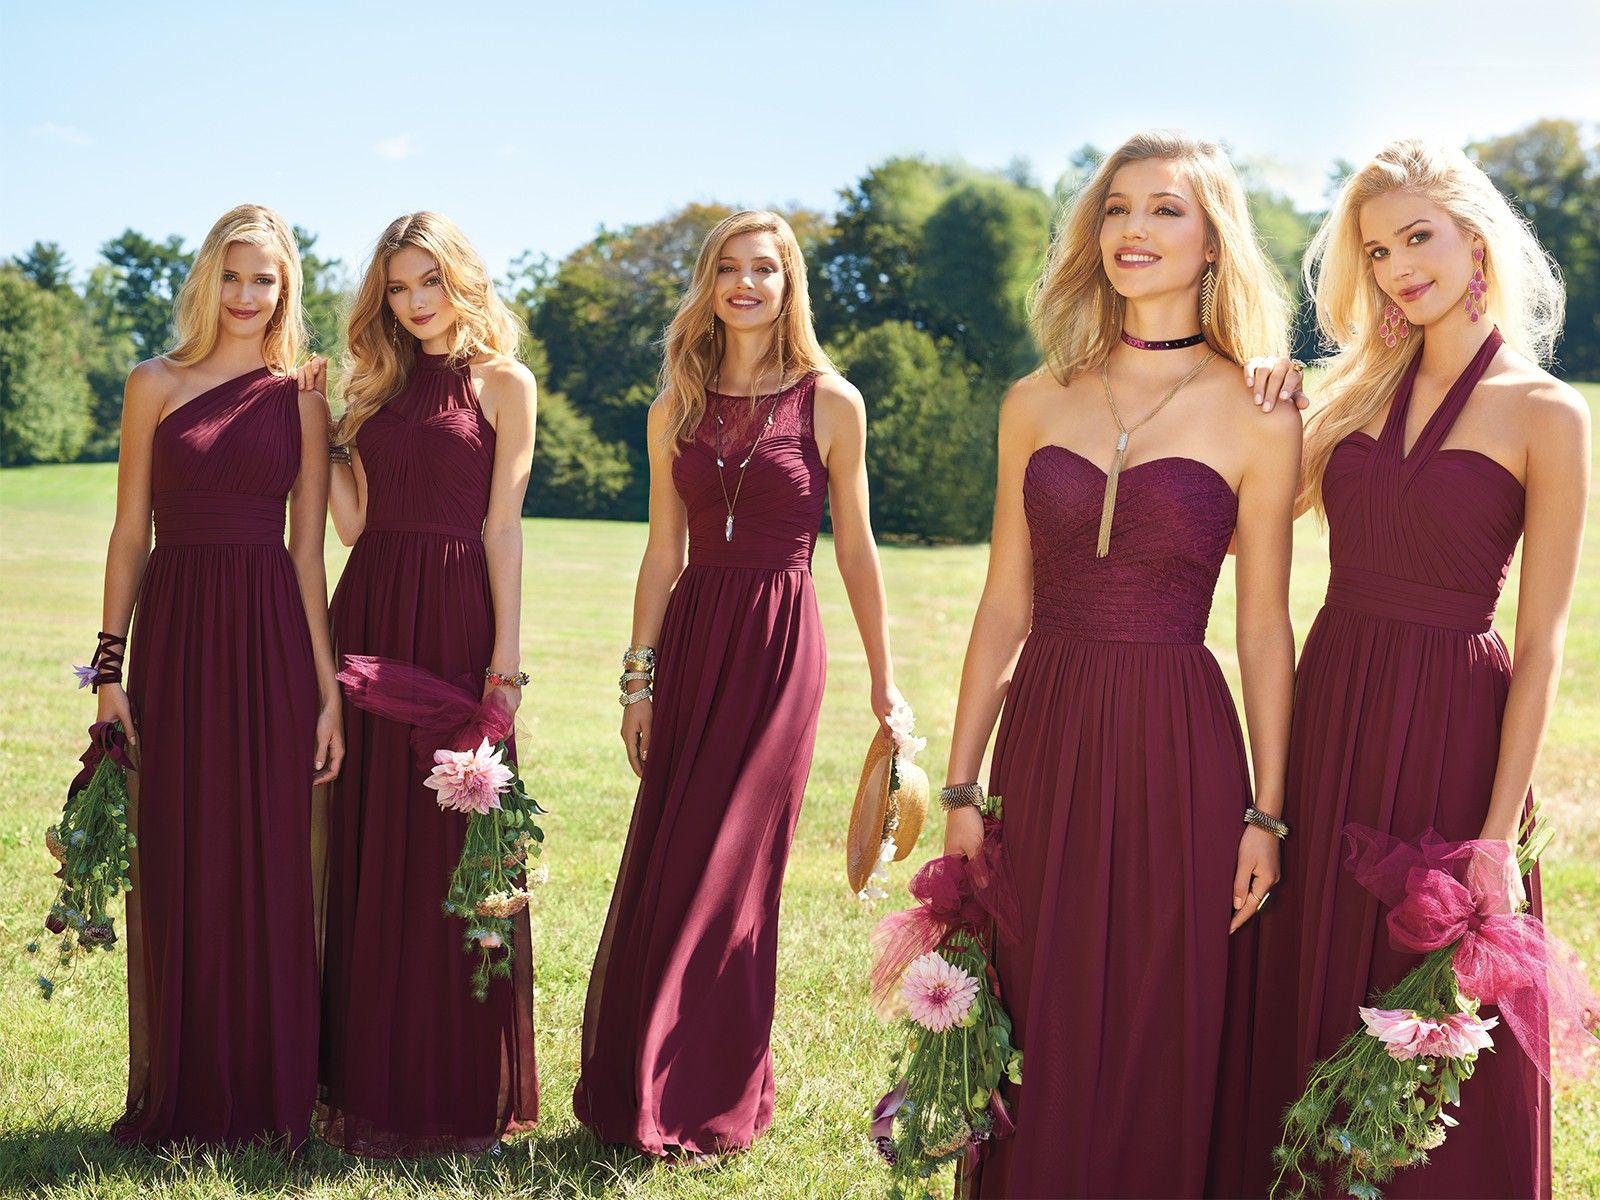 Pin by Lauren von Stackelberg on Bridesmaids Dresses